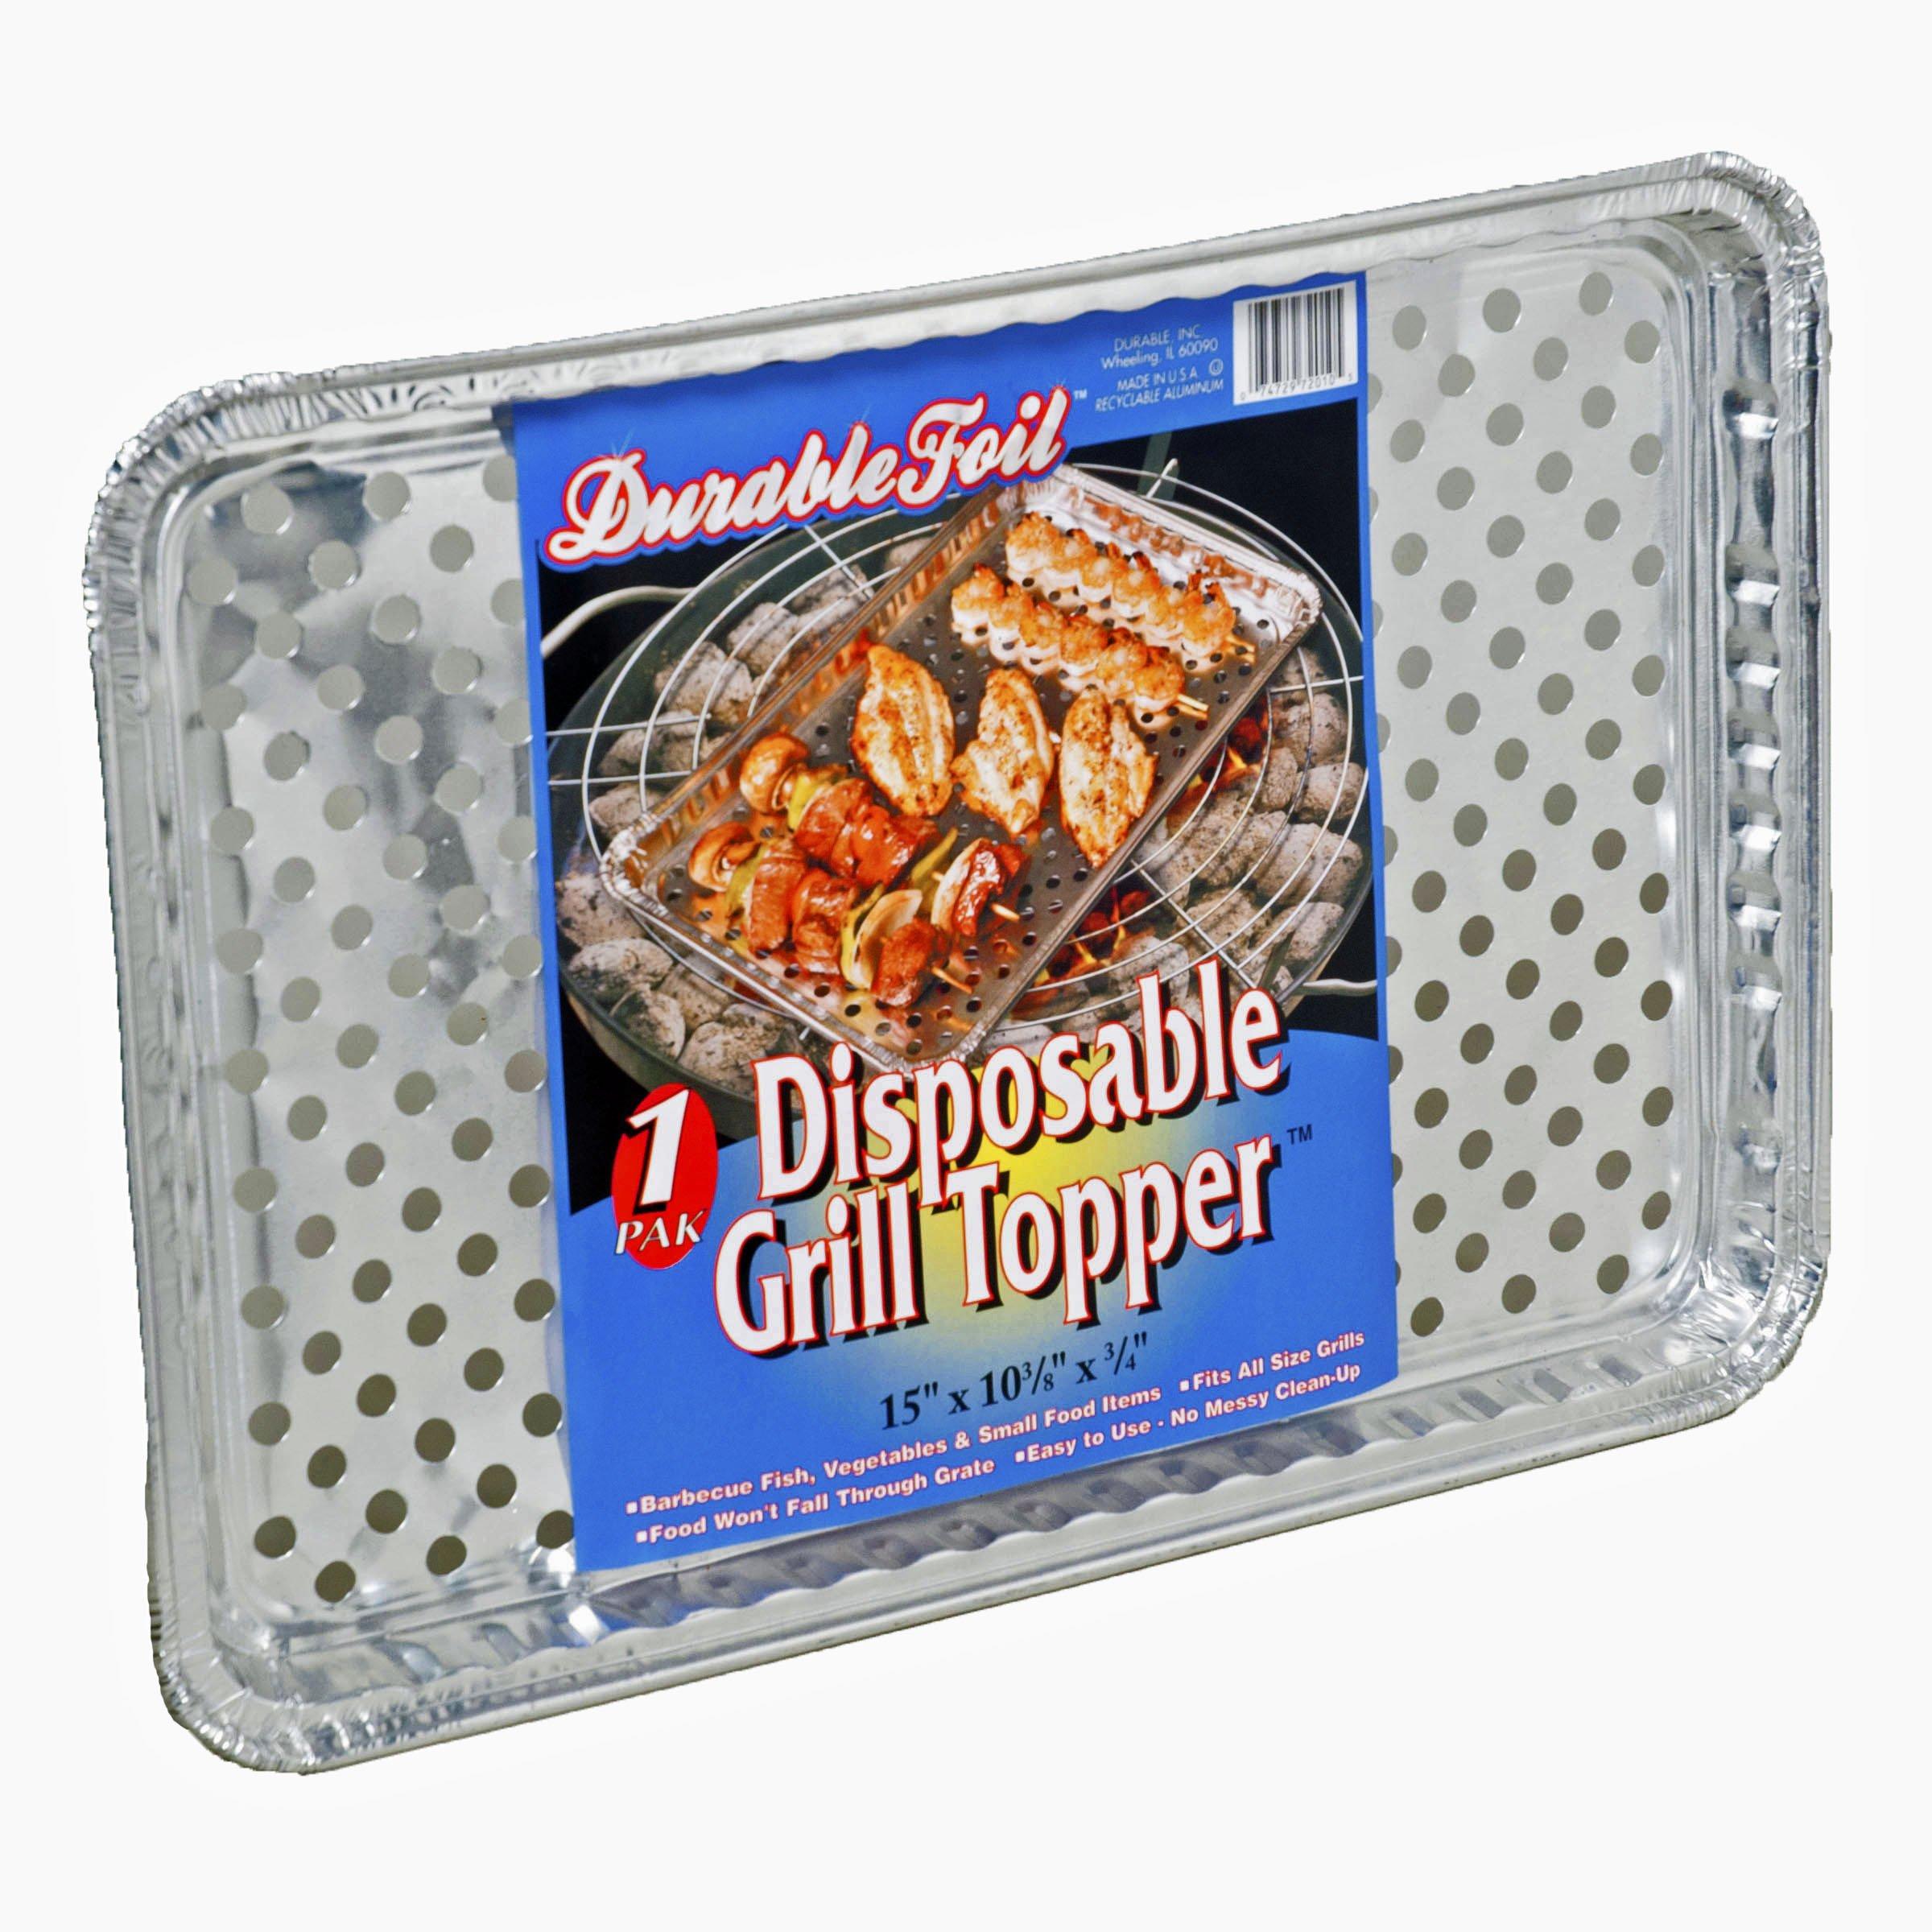 Set of 12 Durable Foil Disposable Deep Grill Topper Pans 11 3/4'' L x 9 1/4'' W x 1 1/2'' D by Durable (Image #3)